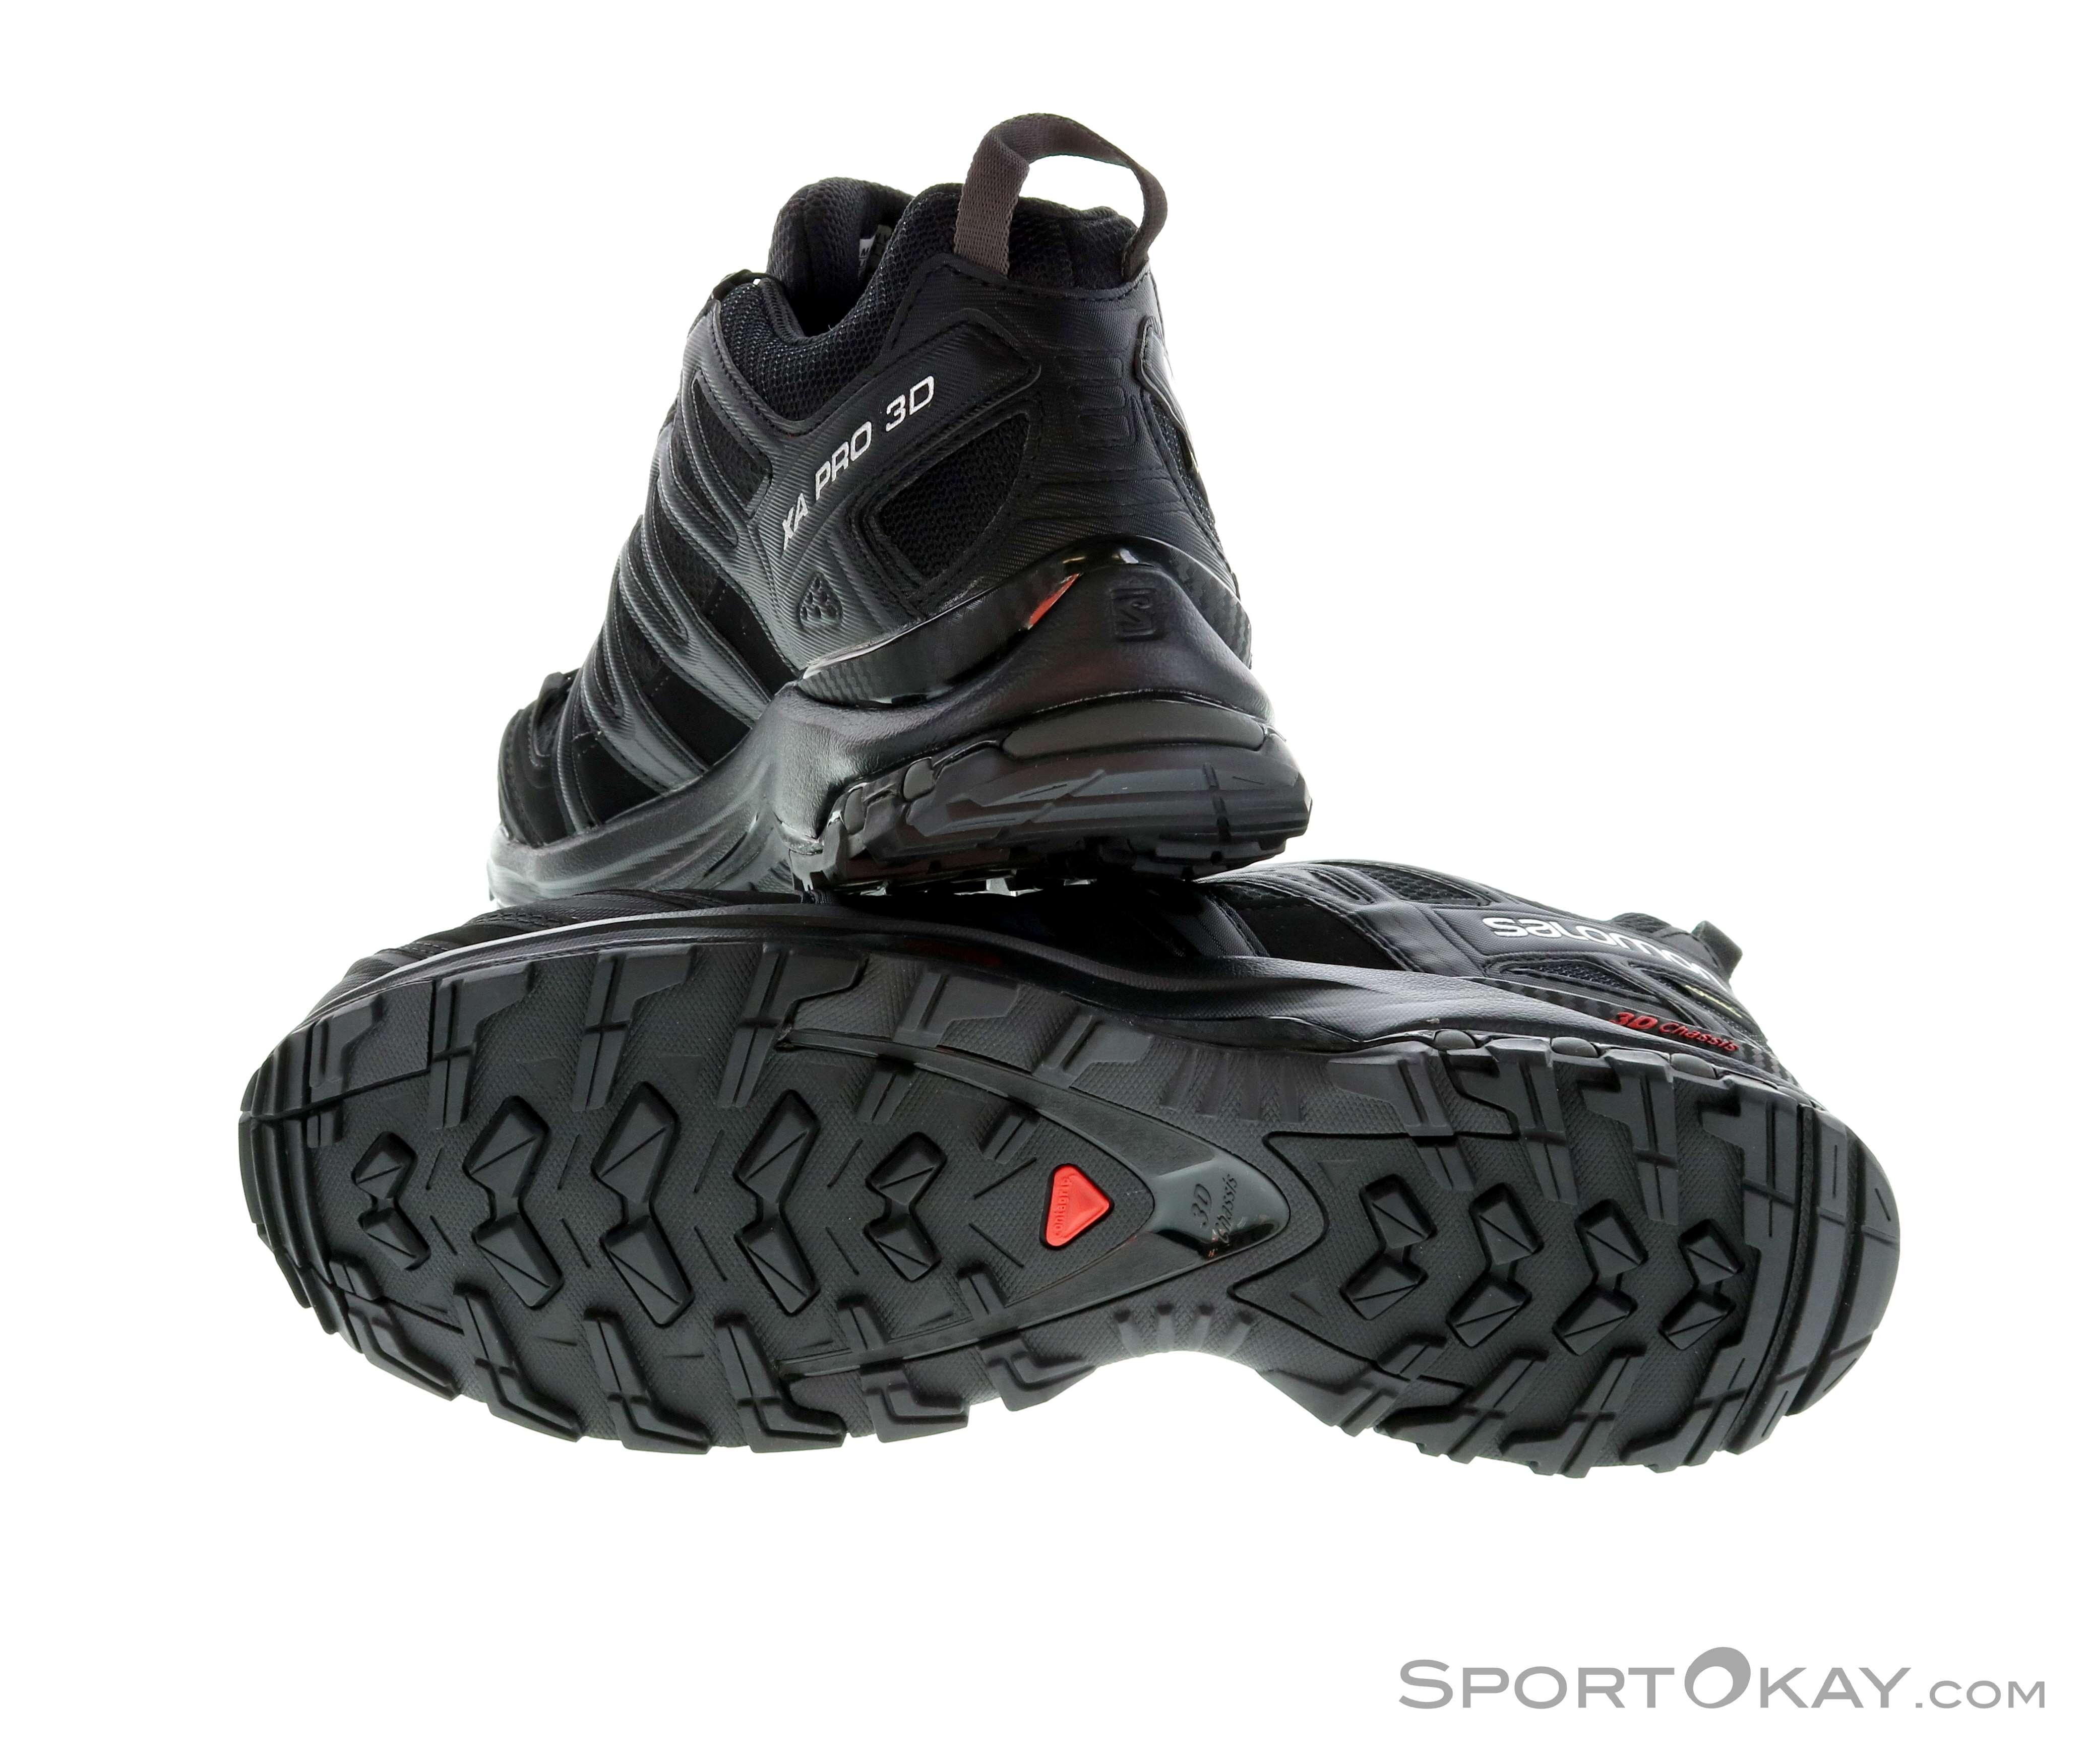 Salomon XA Pro 3D GTX Uomo Scarpe da Trail Running Gore-Tex - Scarpe ... 1d420370255